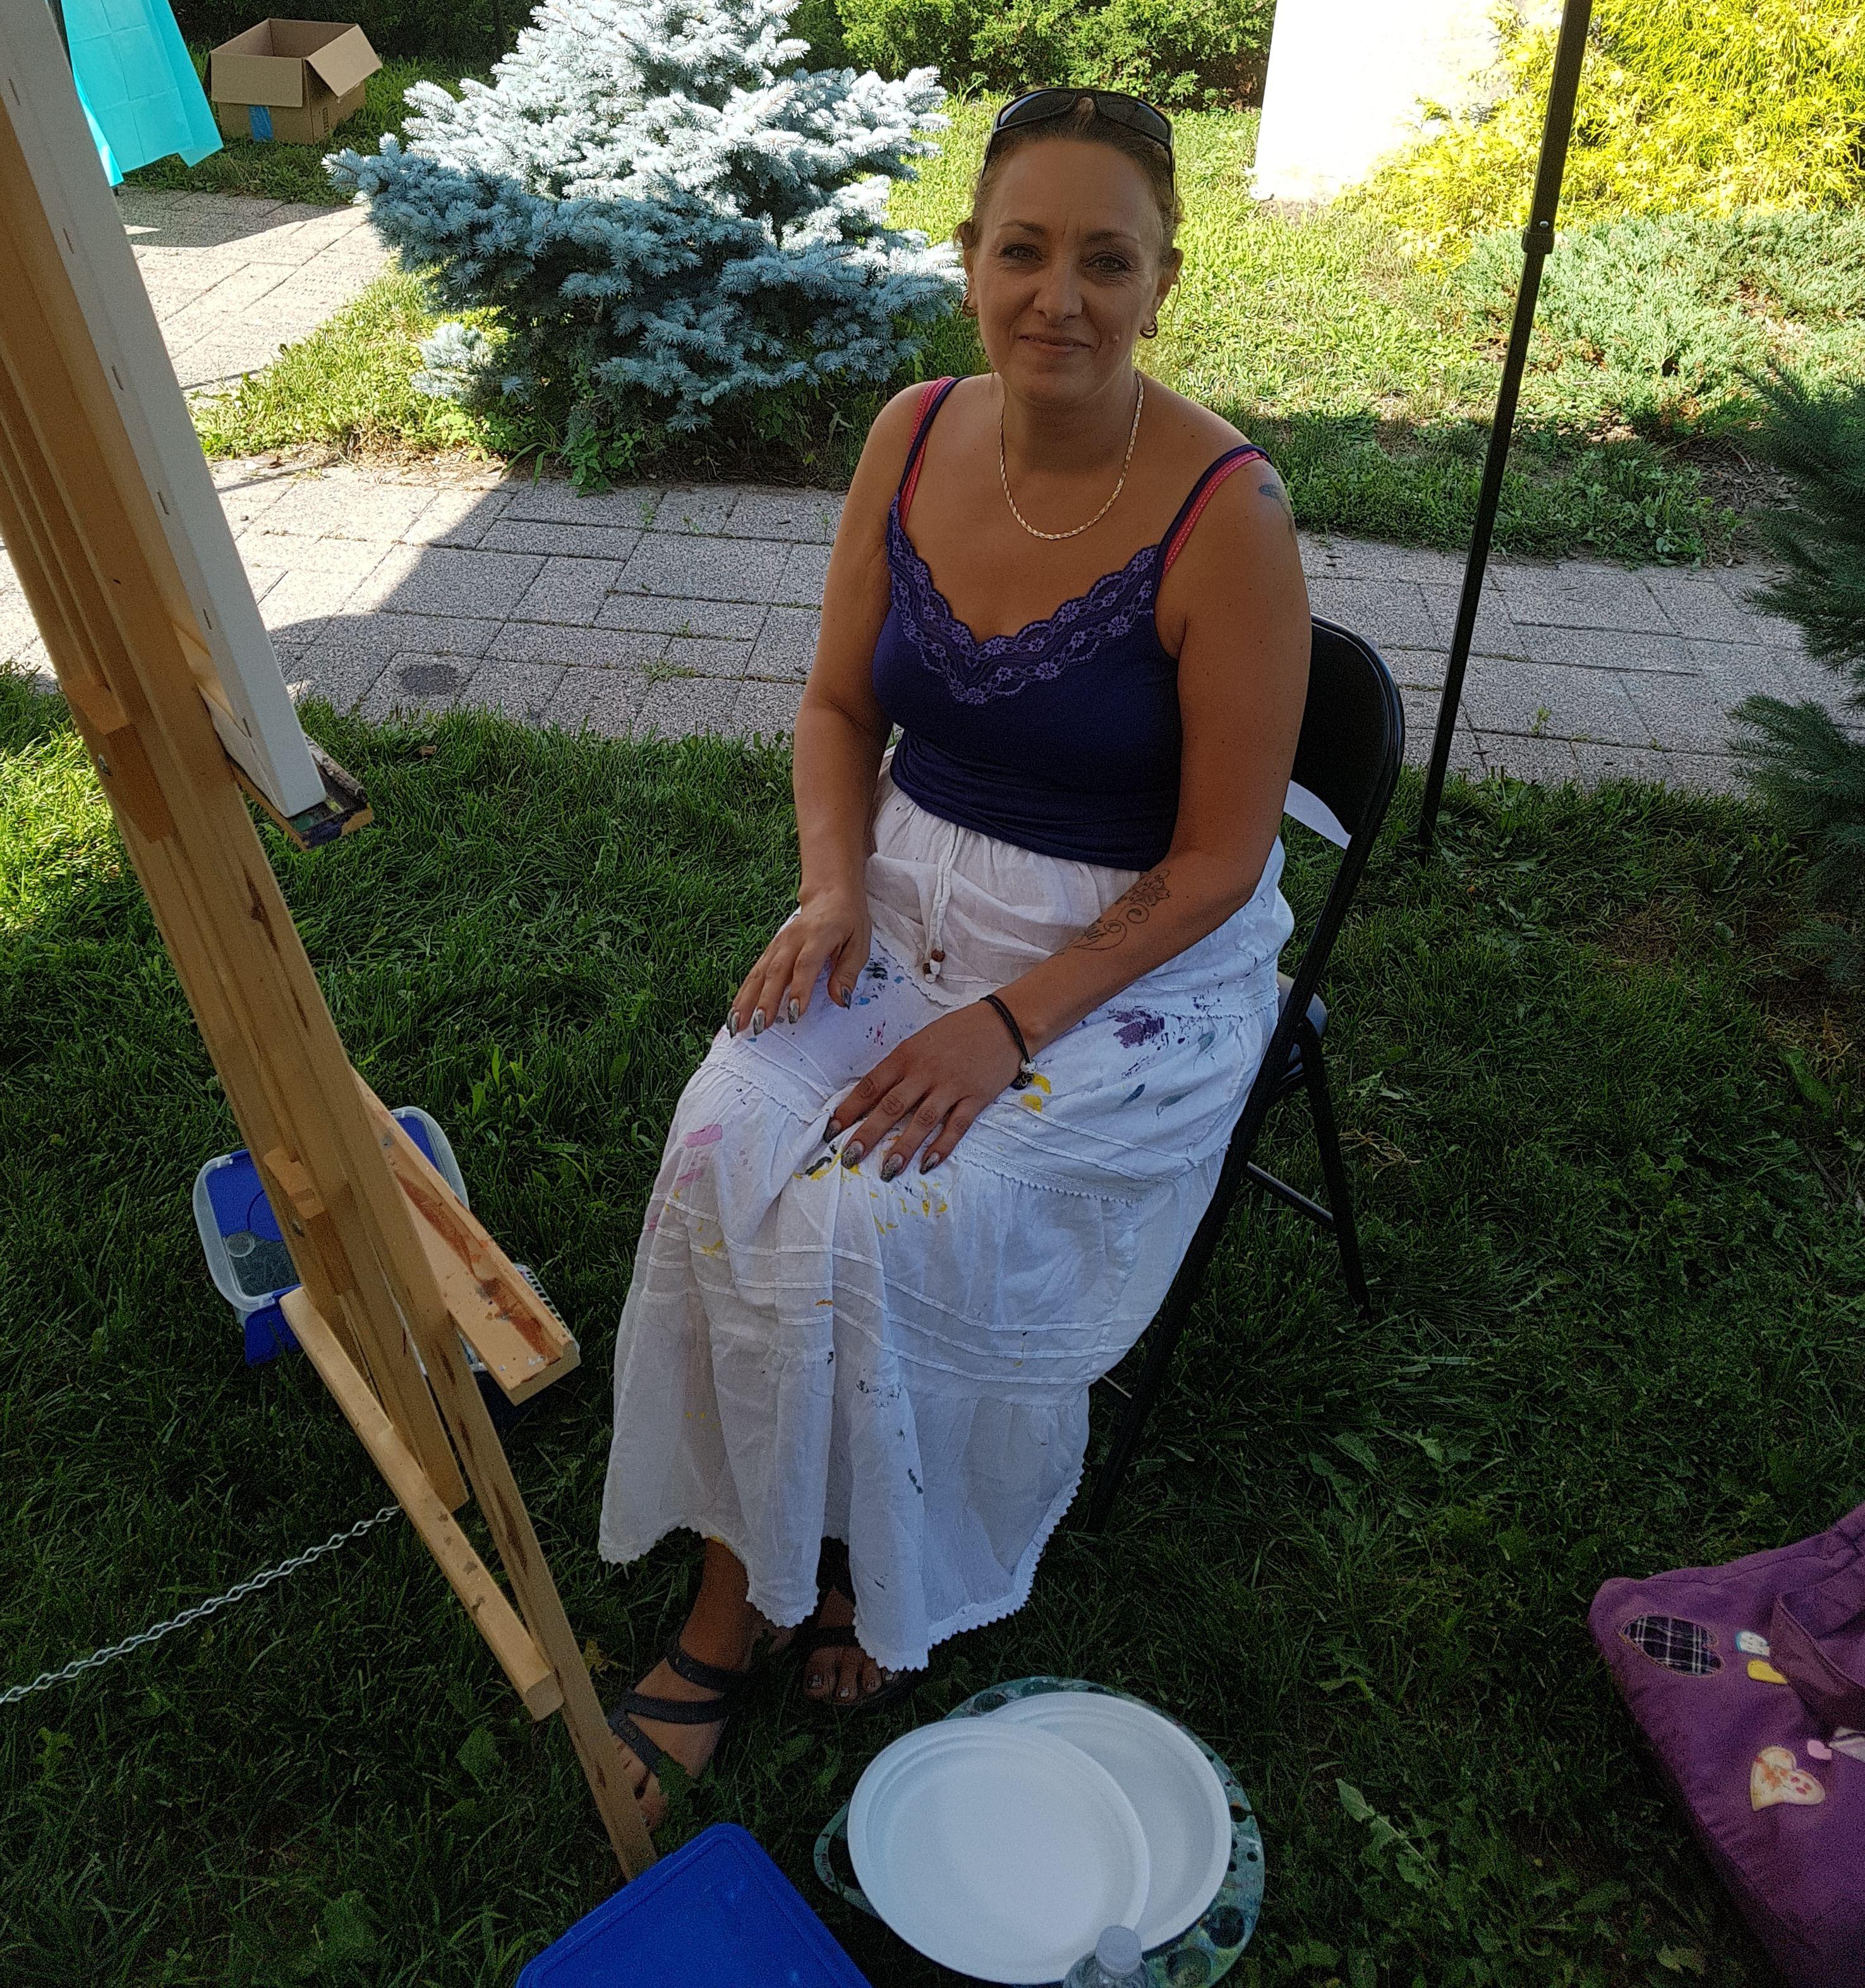 Enjoying a beautiful day painting 😆